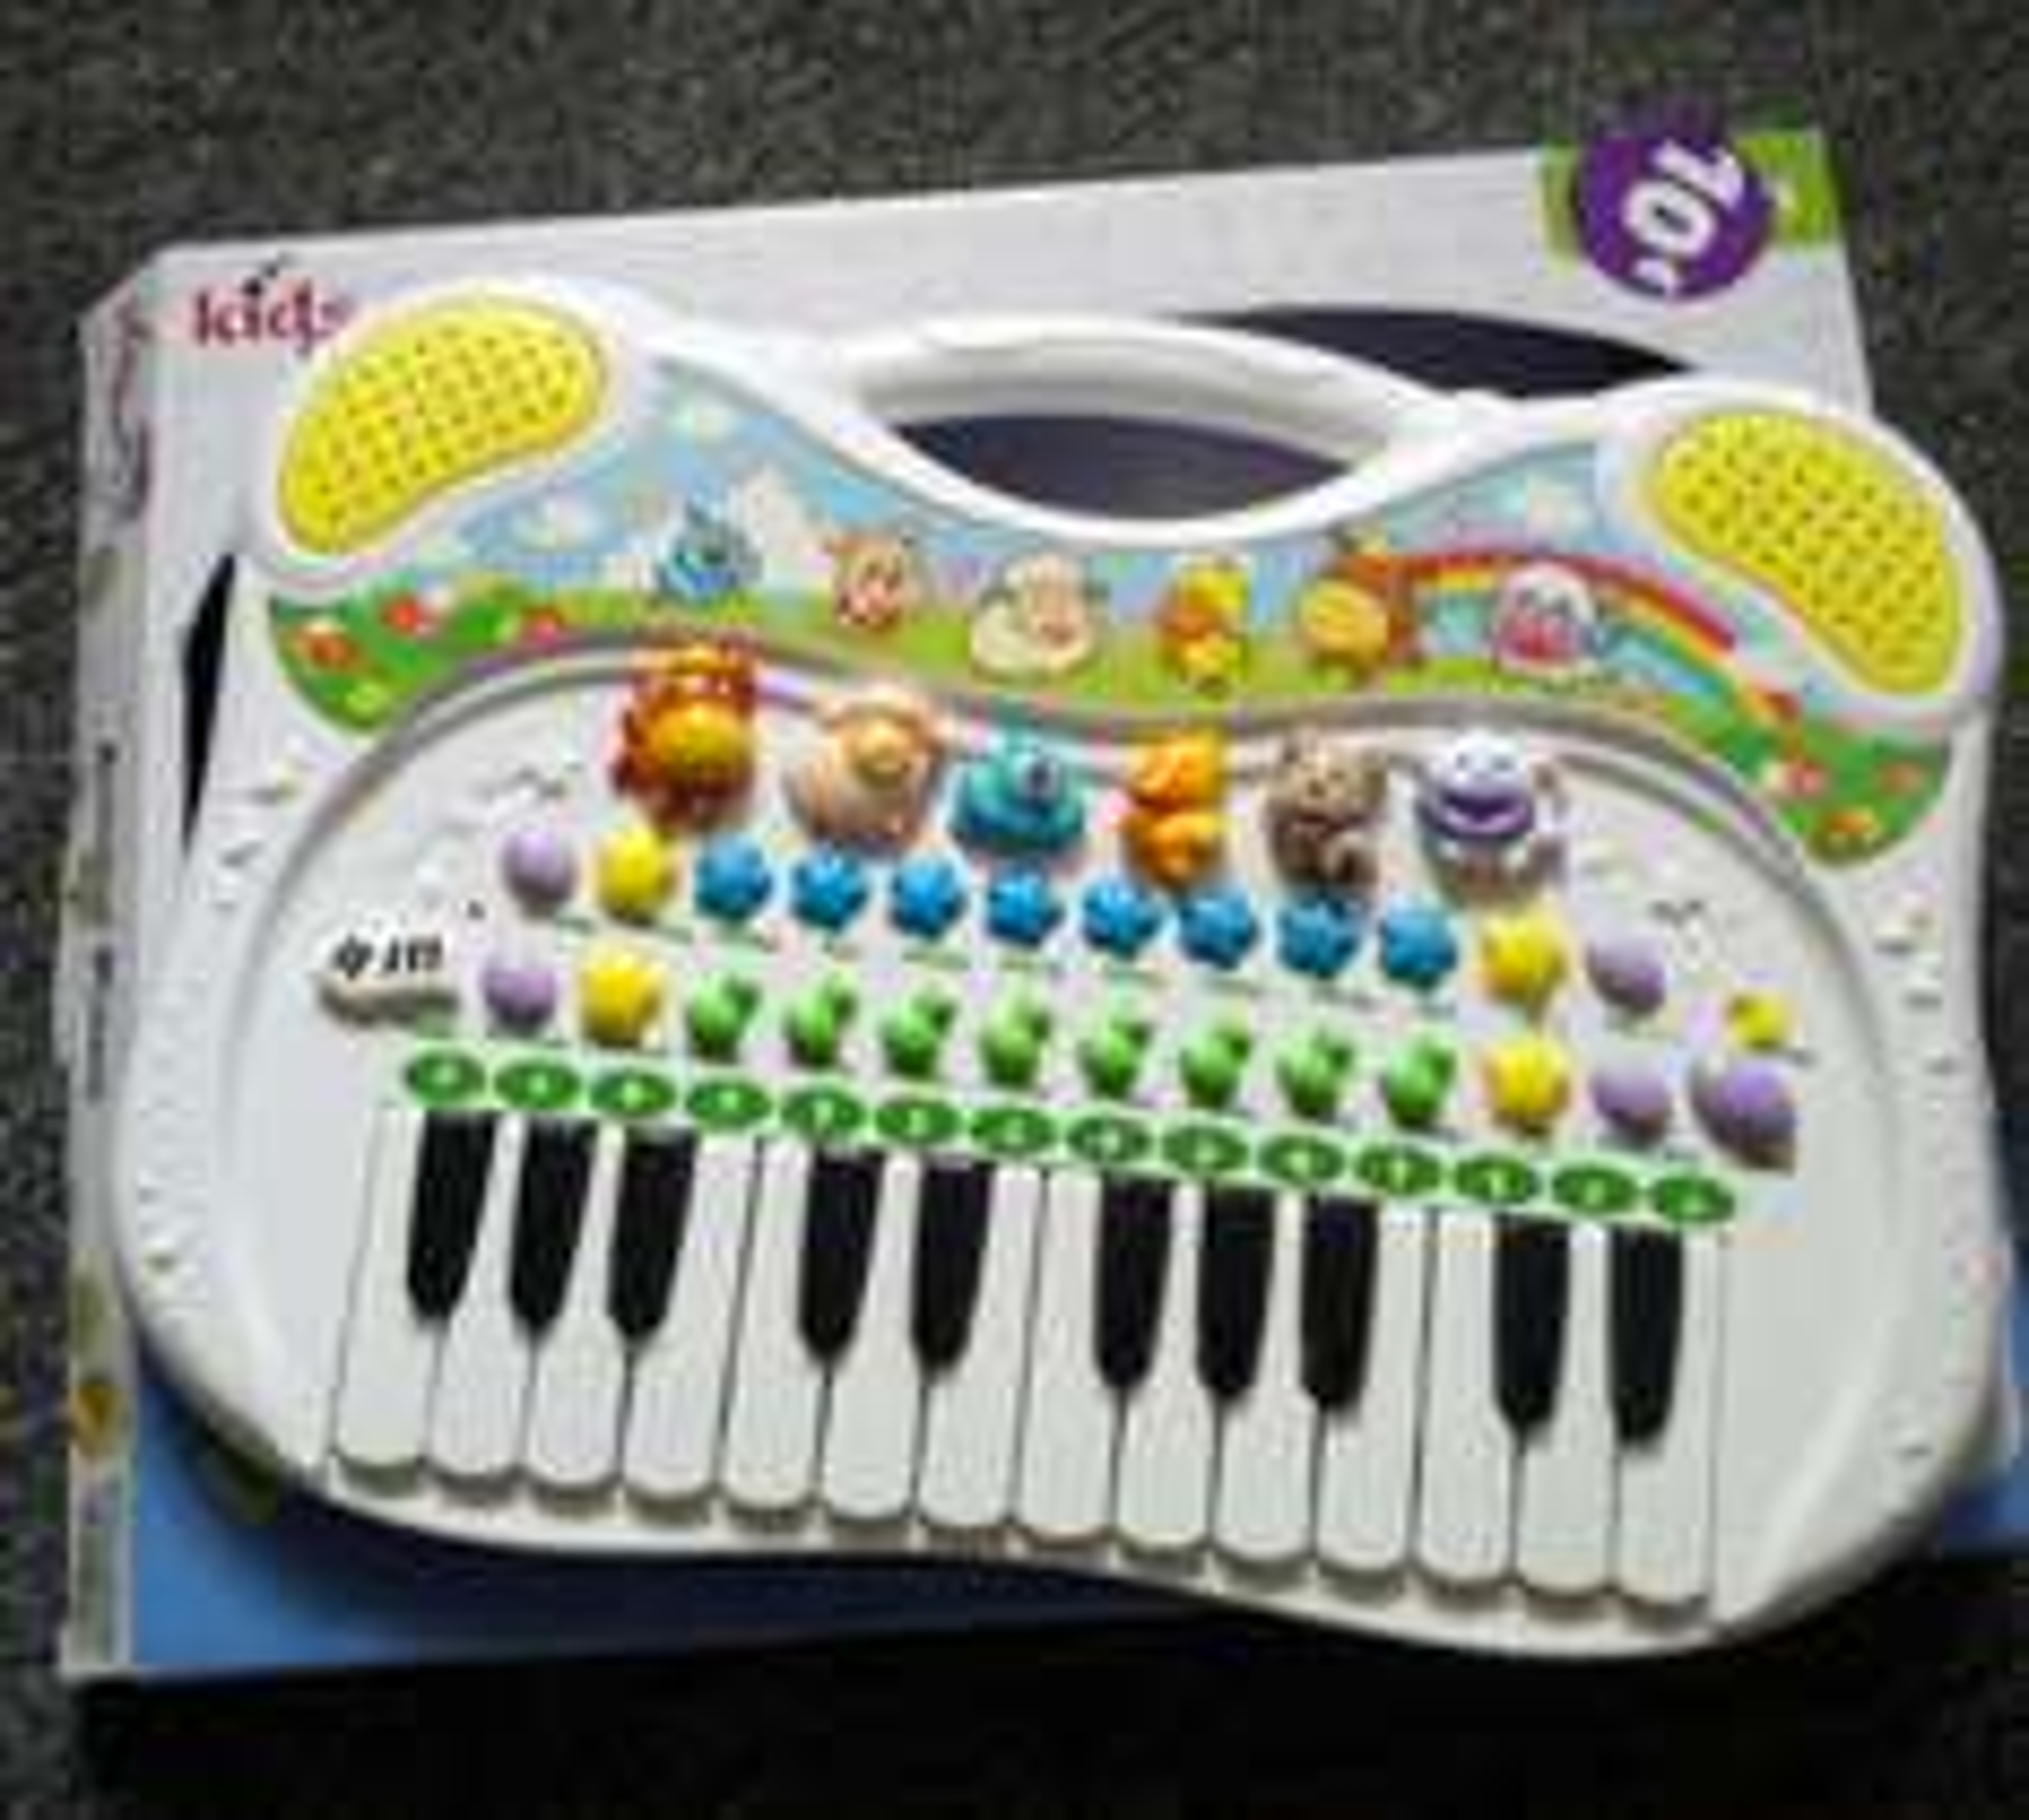 "[lokal] Kaufland Berlin - Animal Piano ""Mein erstes Keyboard"" (10,00€ statt 22,90€ Idealopreis)"